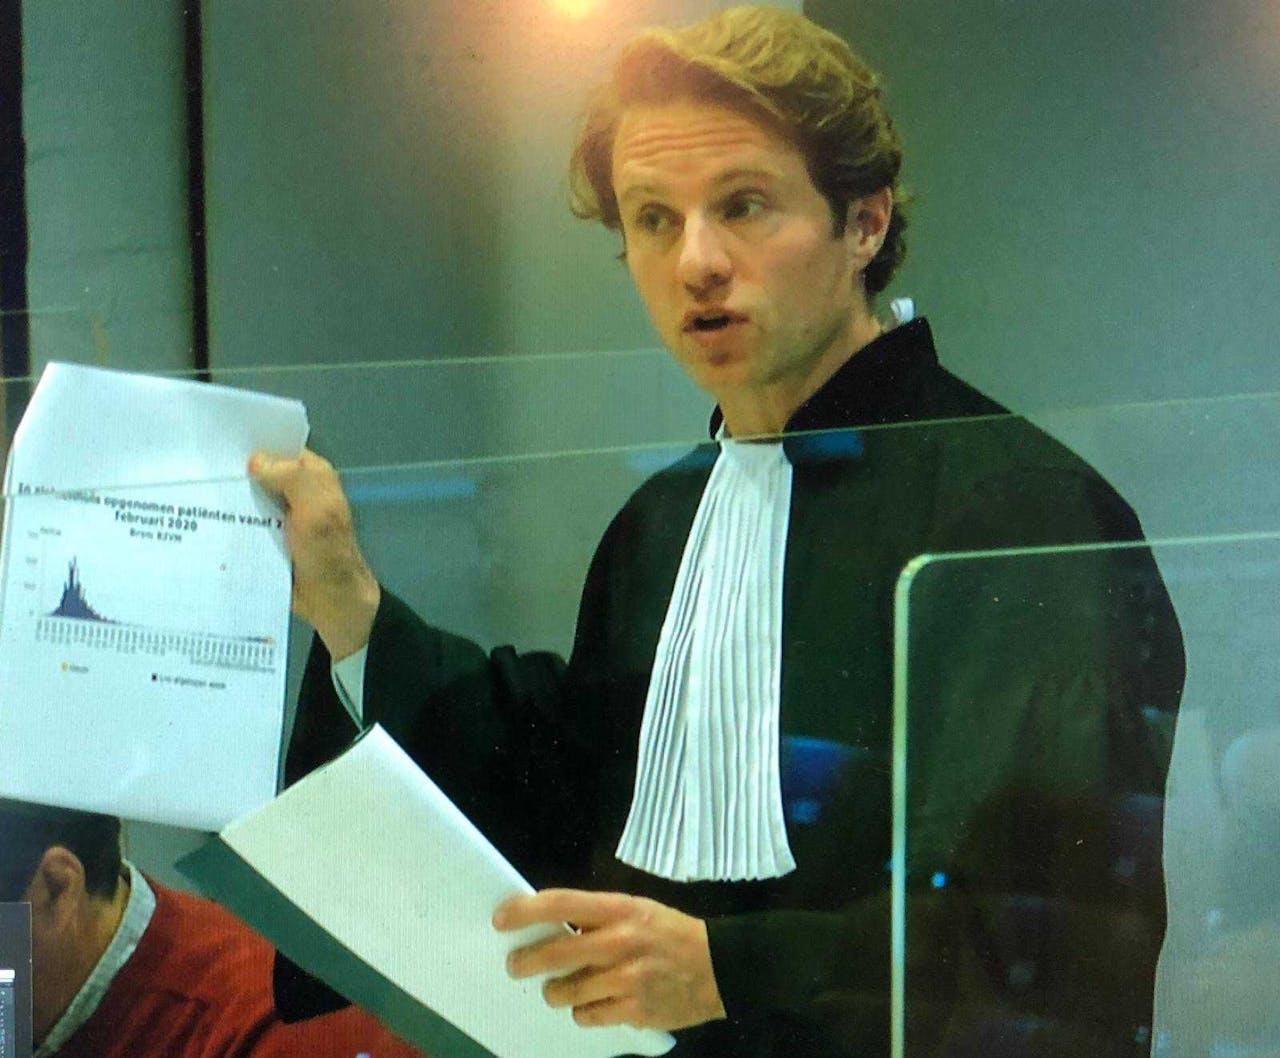 Horeca-advocaat Simon van Zijll